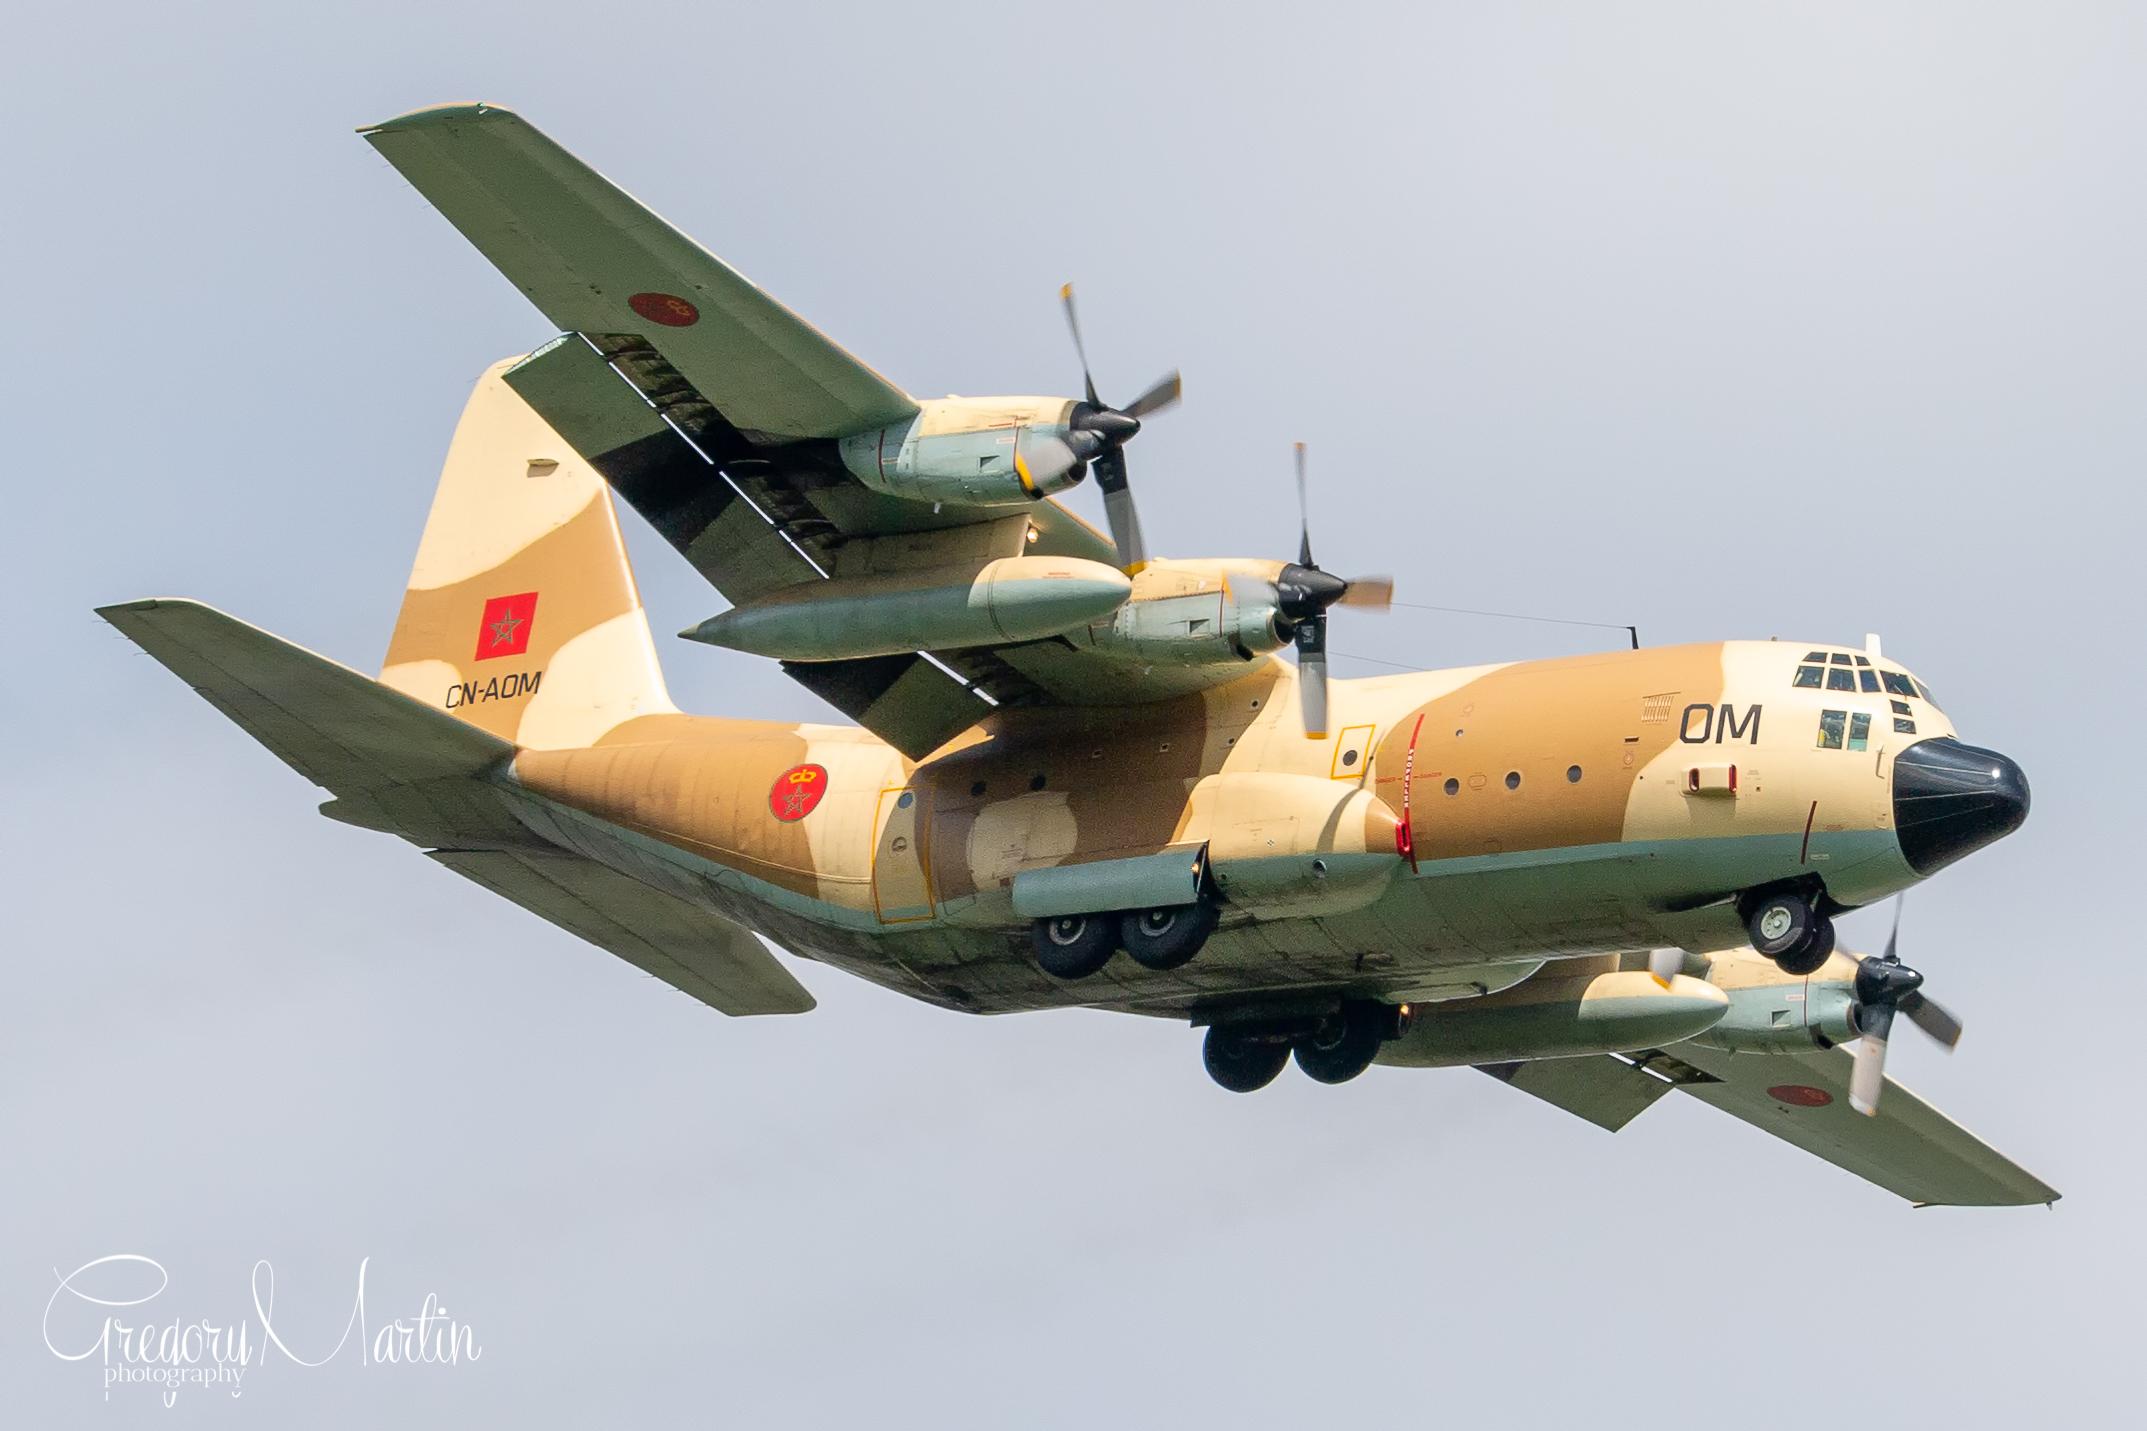 FRA: Photos d'avions de transport - Page 43 51265625571_85637f7c2f_o_d